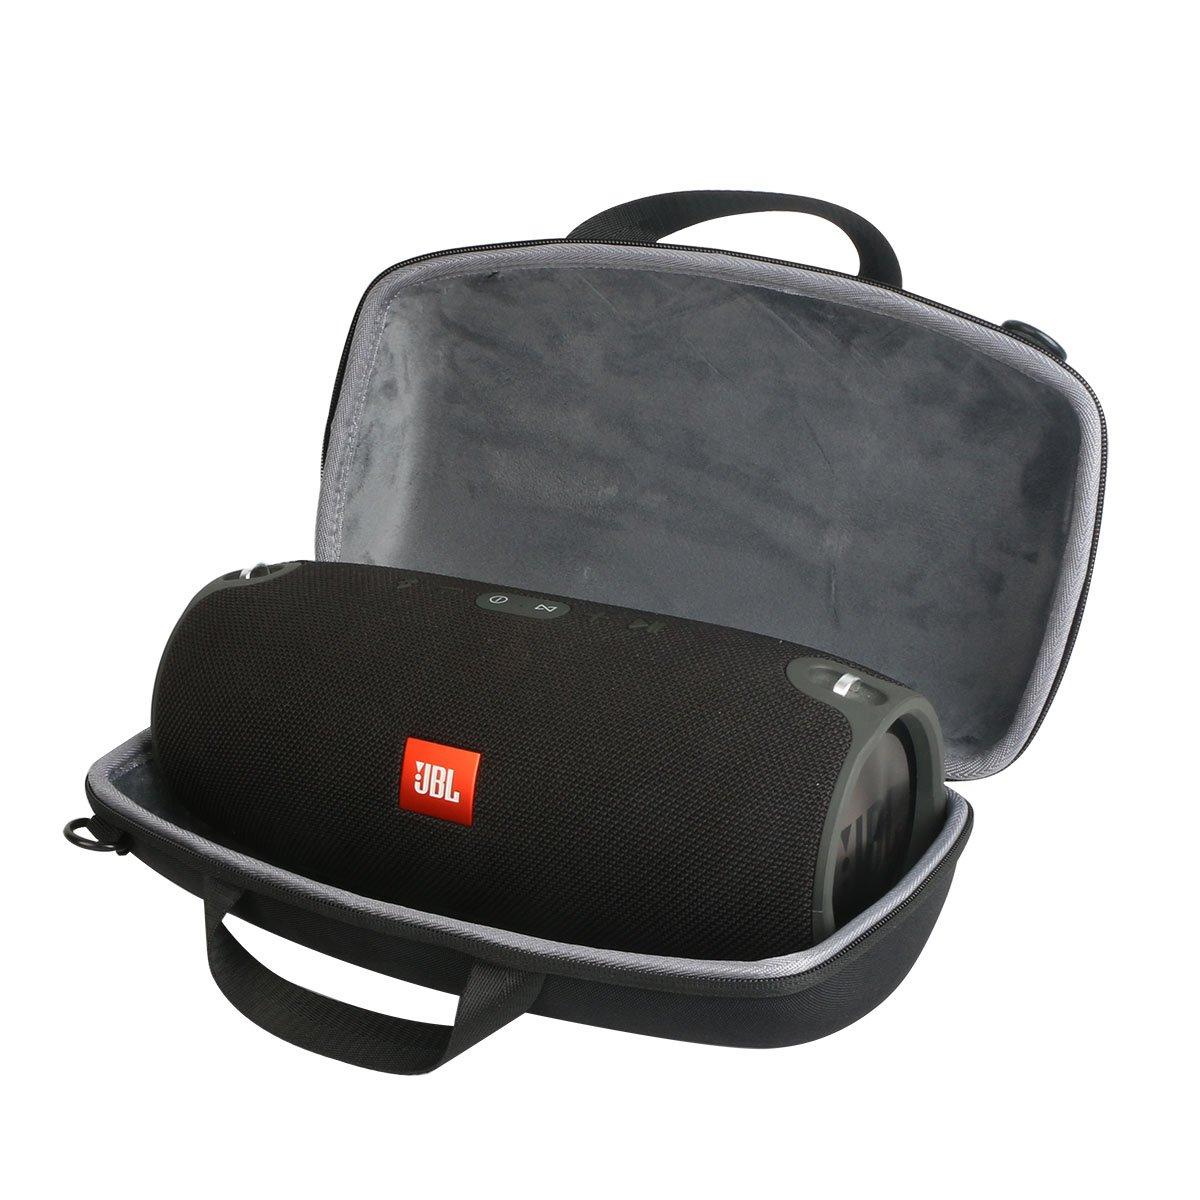 TALLA JBL xtreme. co2CREA Duro Viajar Caso Cubrir para JBL Xtreme - Altavoz Bluetooth portátil(Speaker Case)